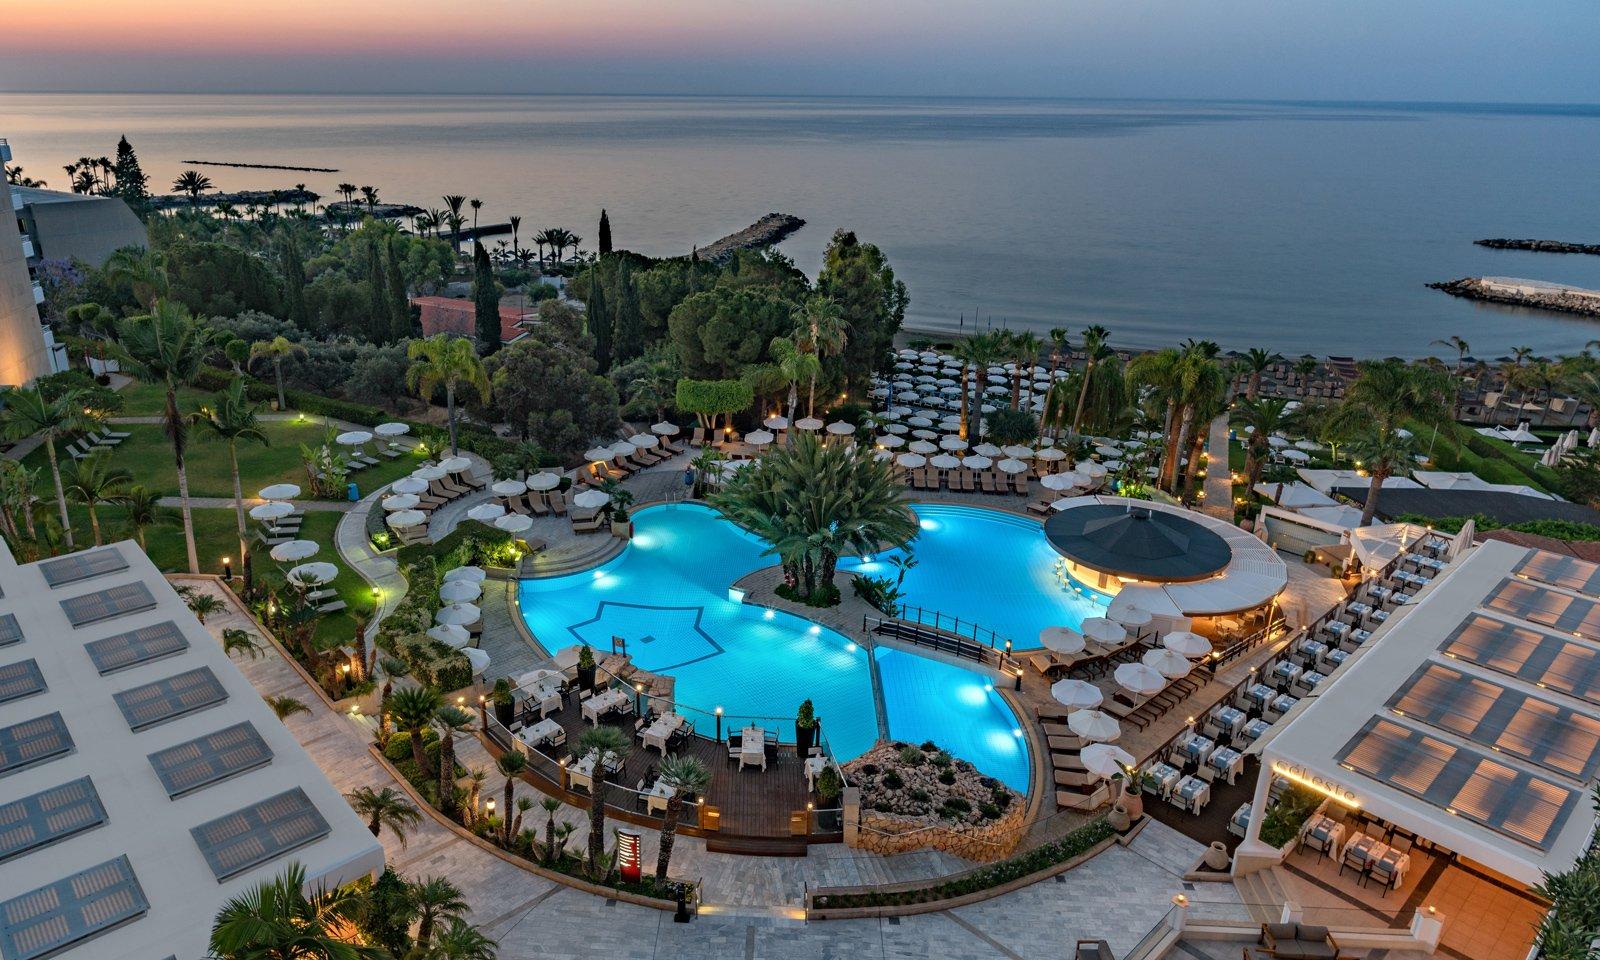 Mediterranean Beach Hotel 4-Limassol-Jumbo Travel-pool overview